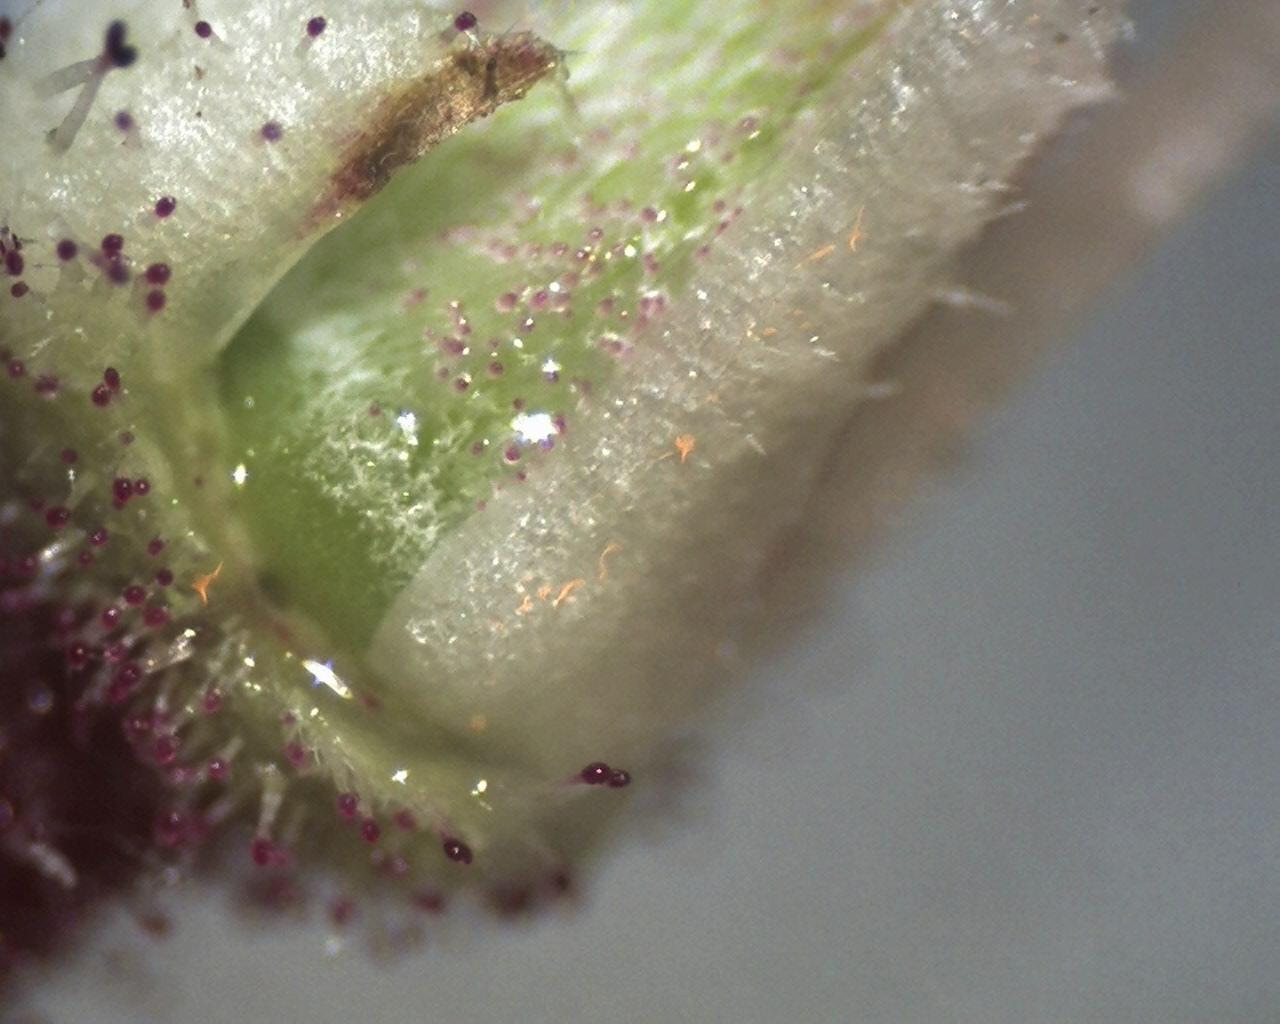 Rh. viscosum ovary w. glandular hairs x60, Aixingarden 2016